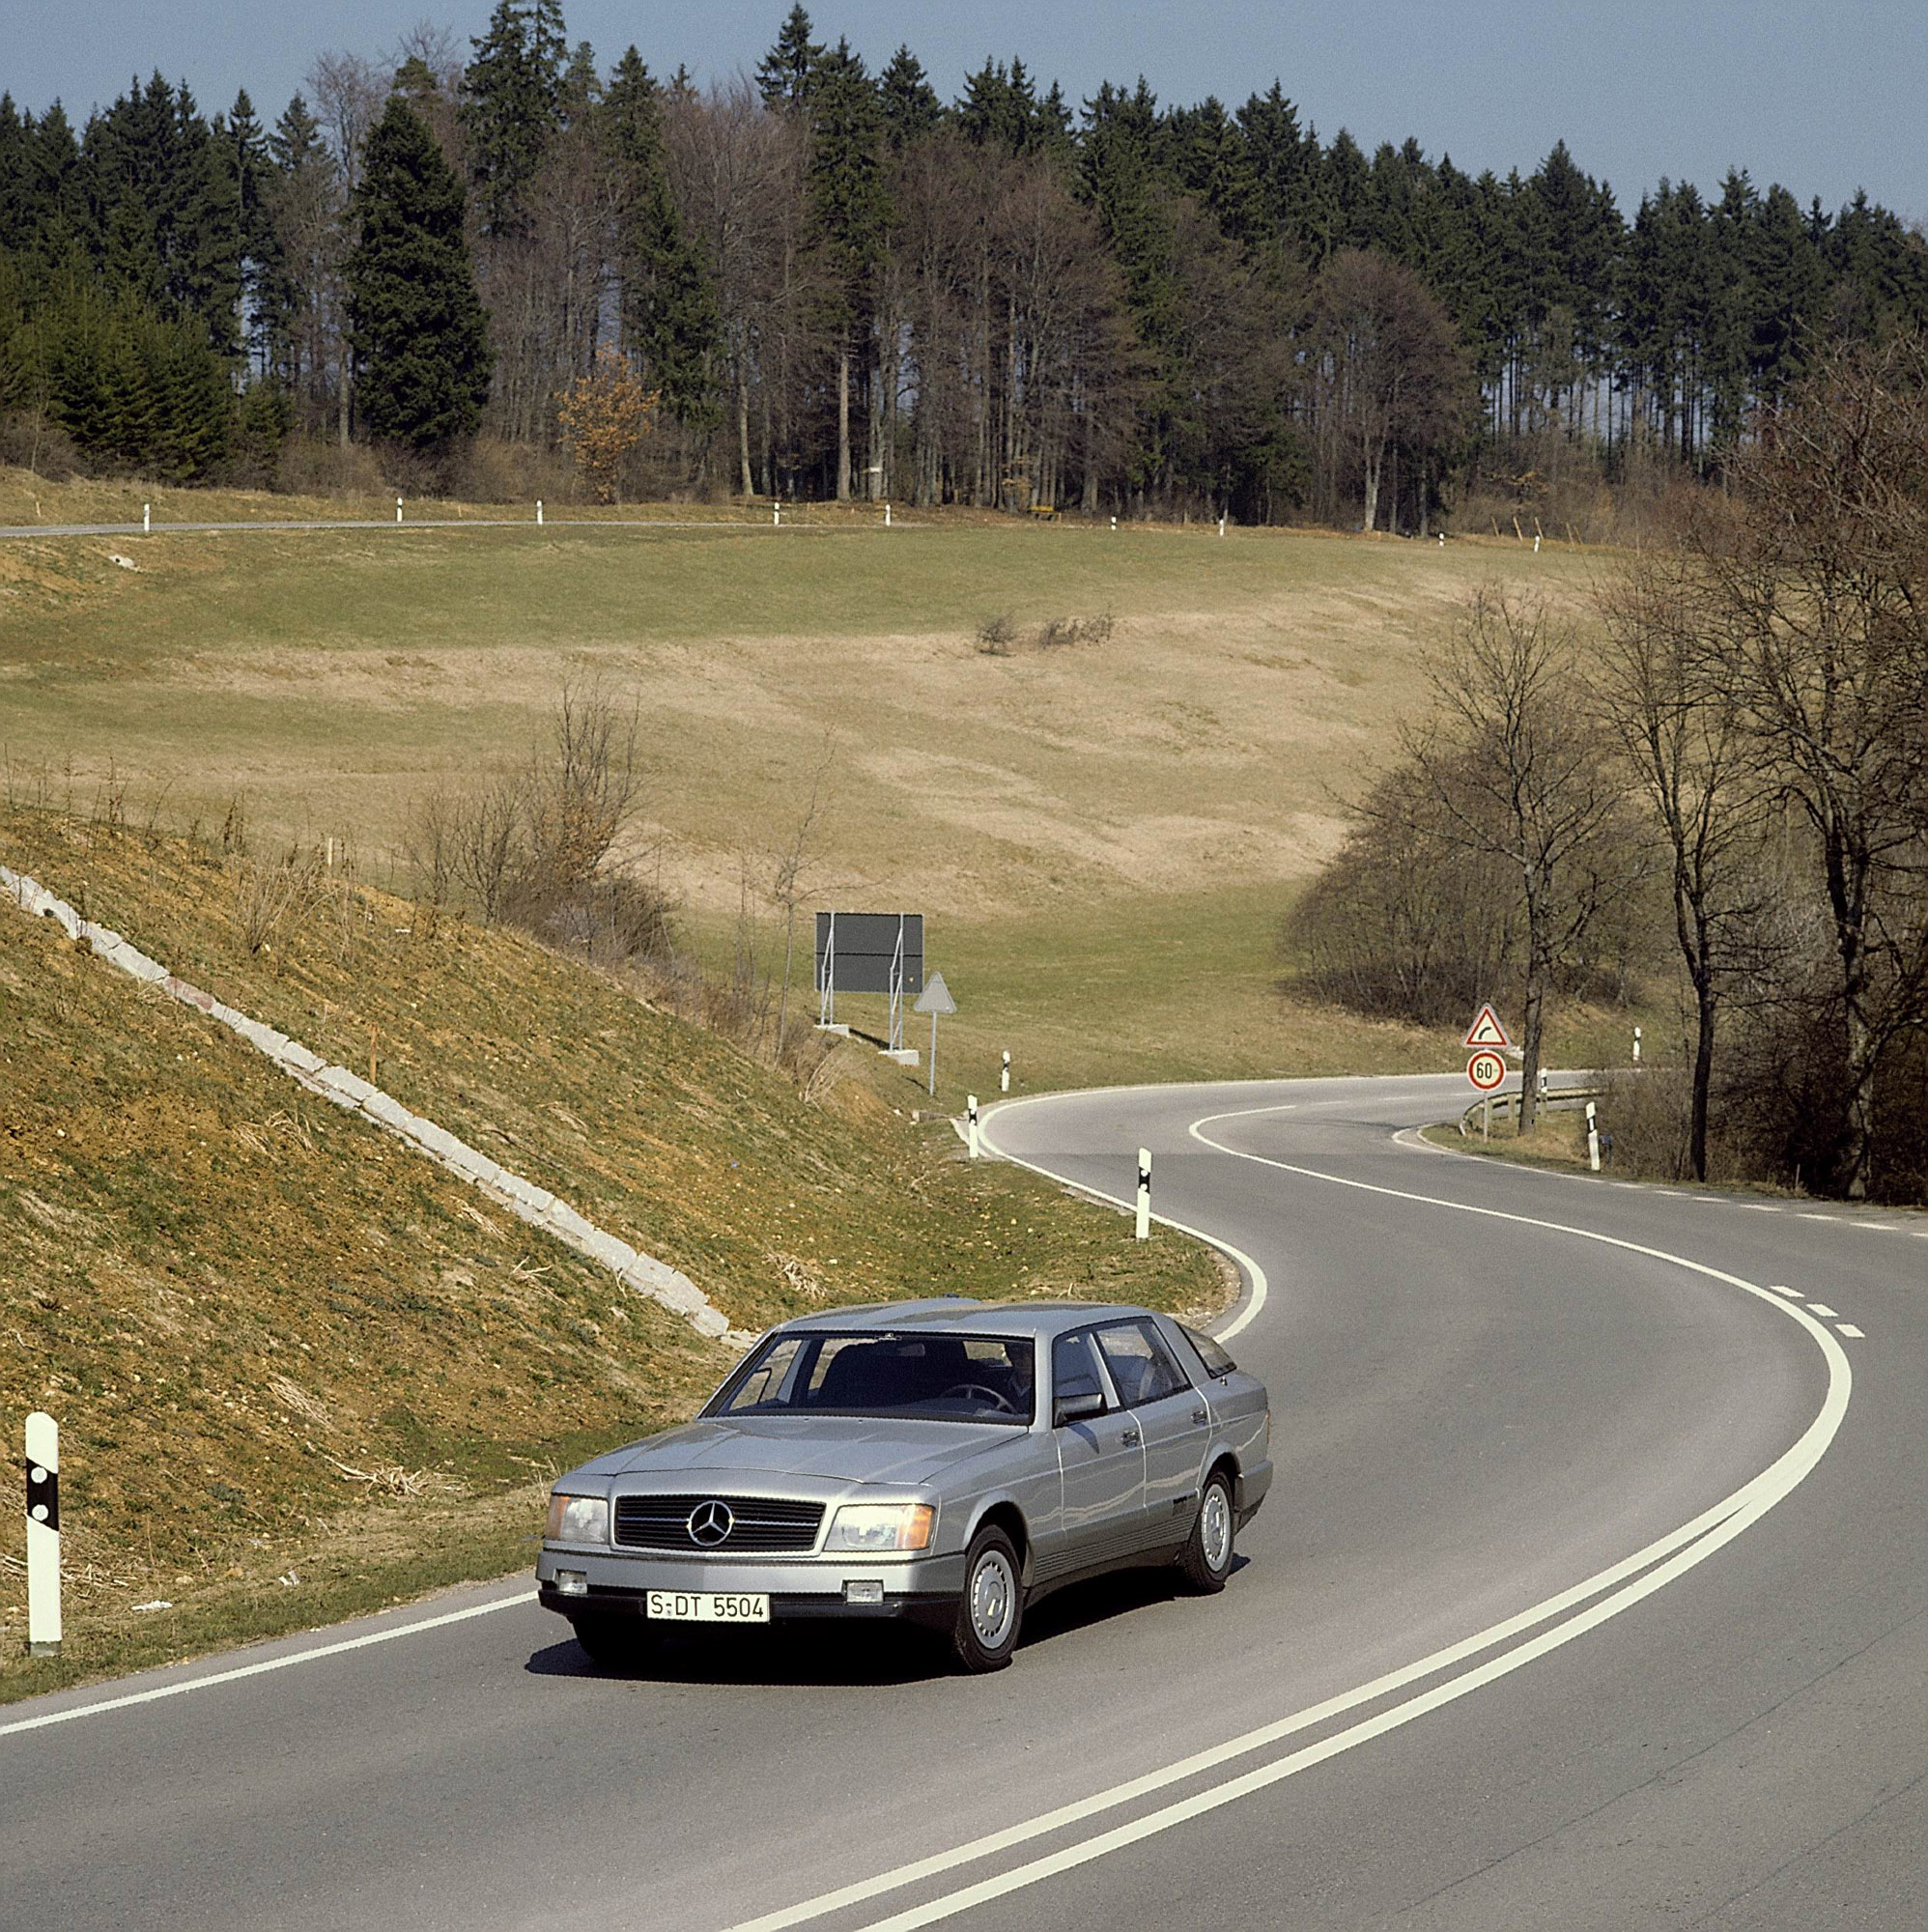 Chicago Mercedes Benz Service: SR Auto Enhances BMW F10 M5